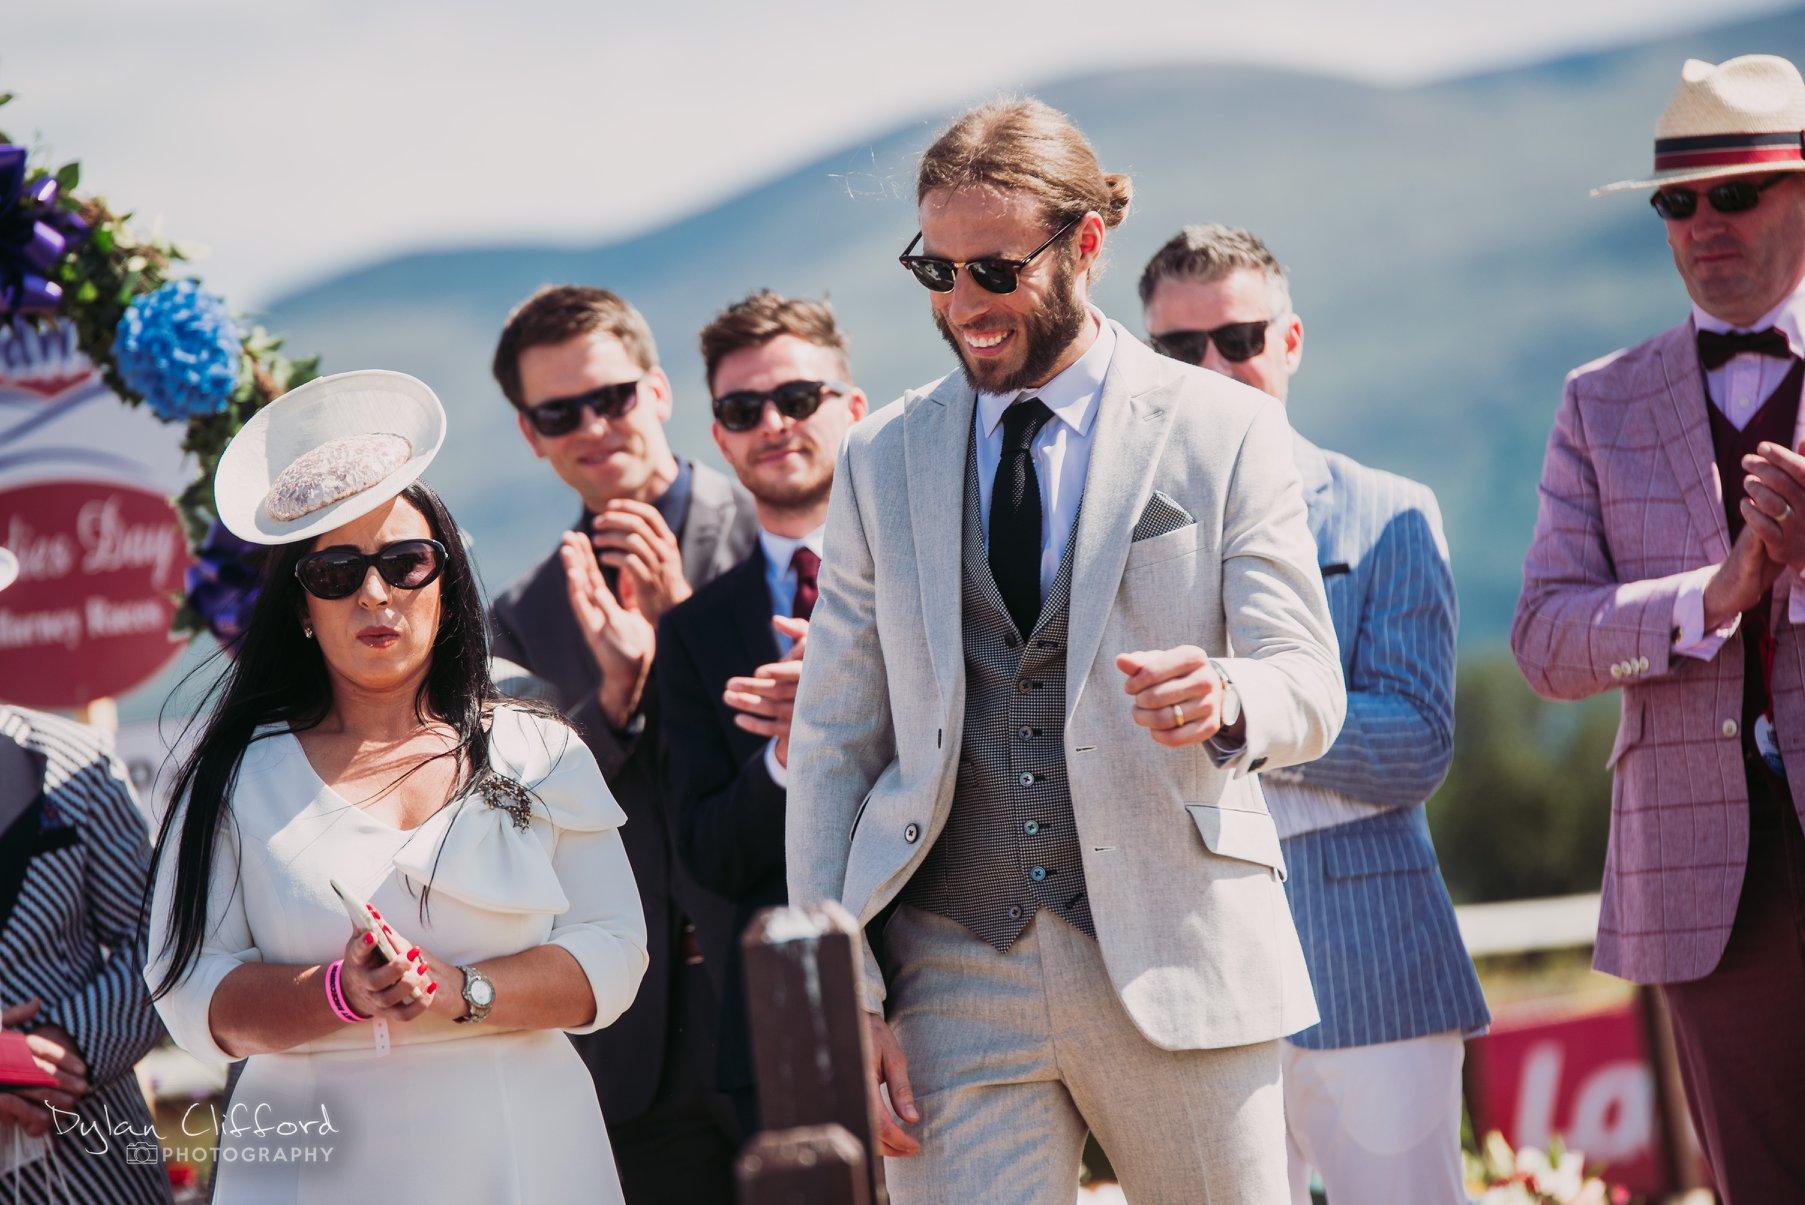 Michael Dorgan after winning Best Dressed Gent at Killarney Races